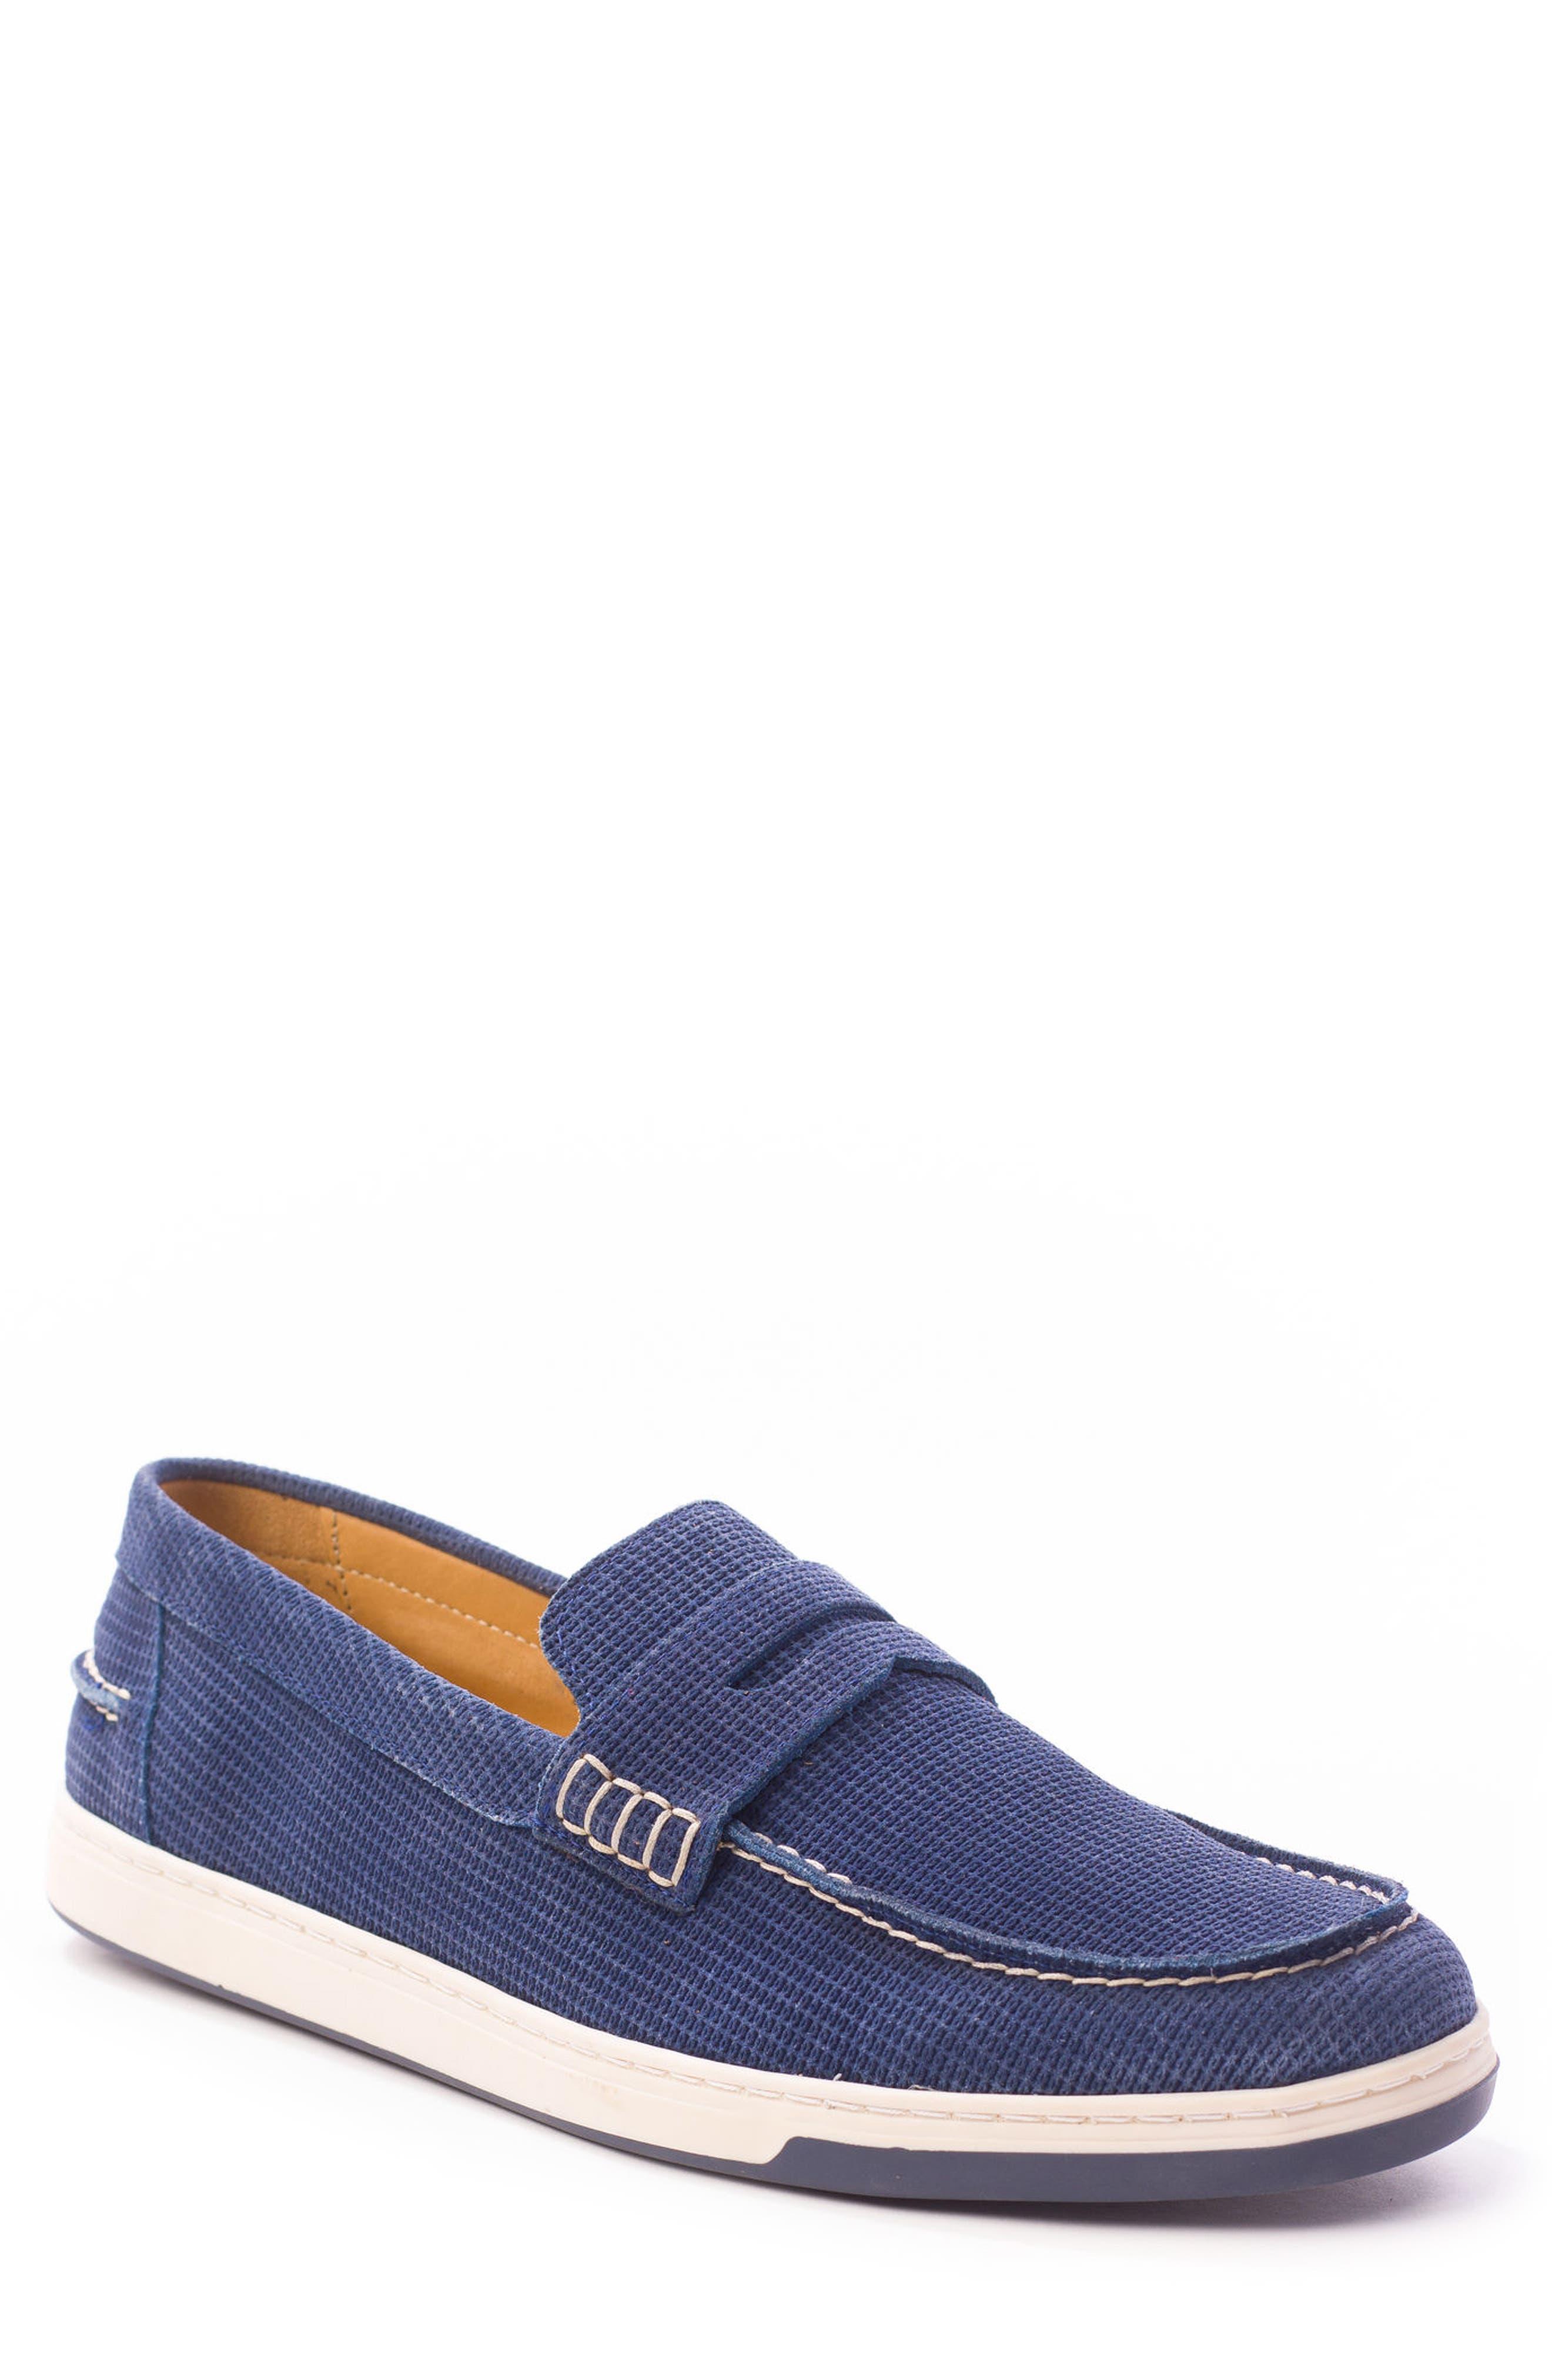 Bradford Embossed Penny Loafer Sneaker,                         Main,                         color, DARK INDIGO